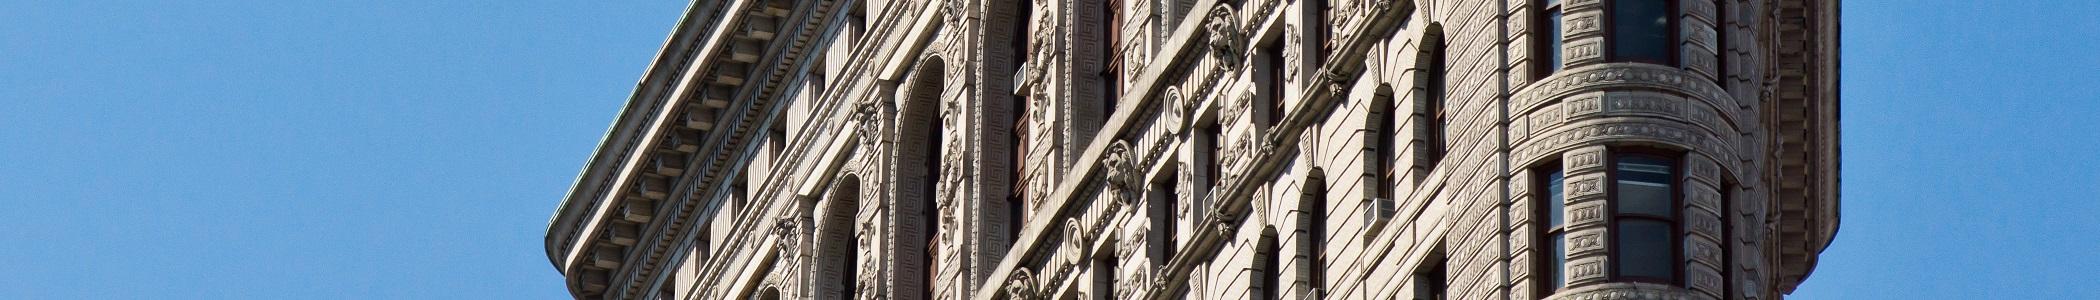 Manhattan Gramercy Flatiron Travel Guide At Wikivoyage